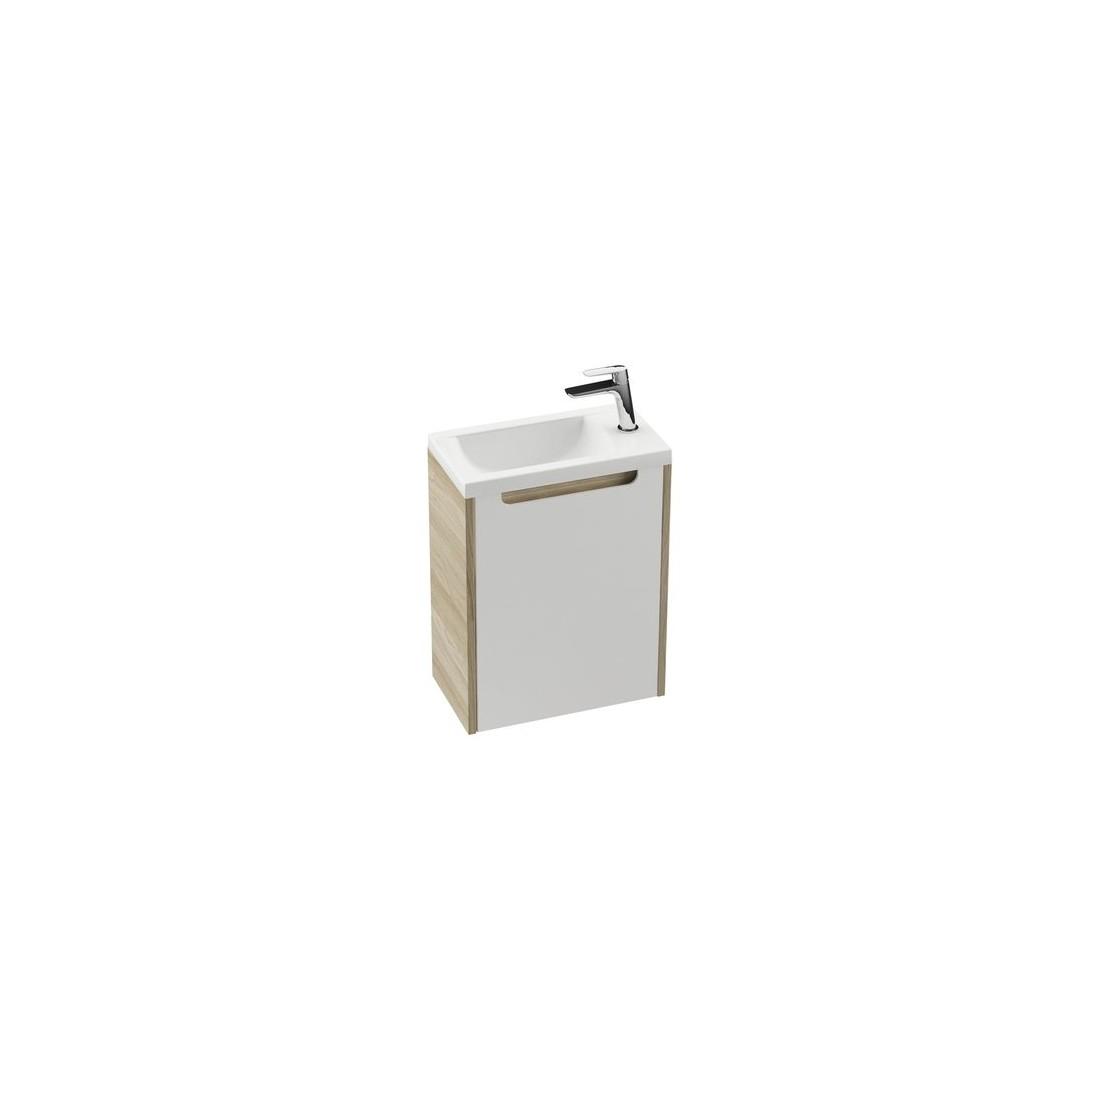 Durelės spintelei po praustuvu Ravak SD 400 Classic, R balta